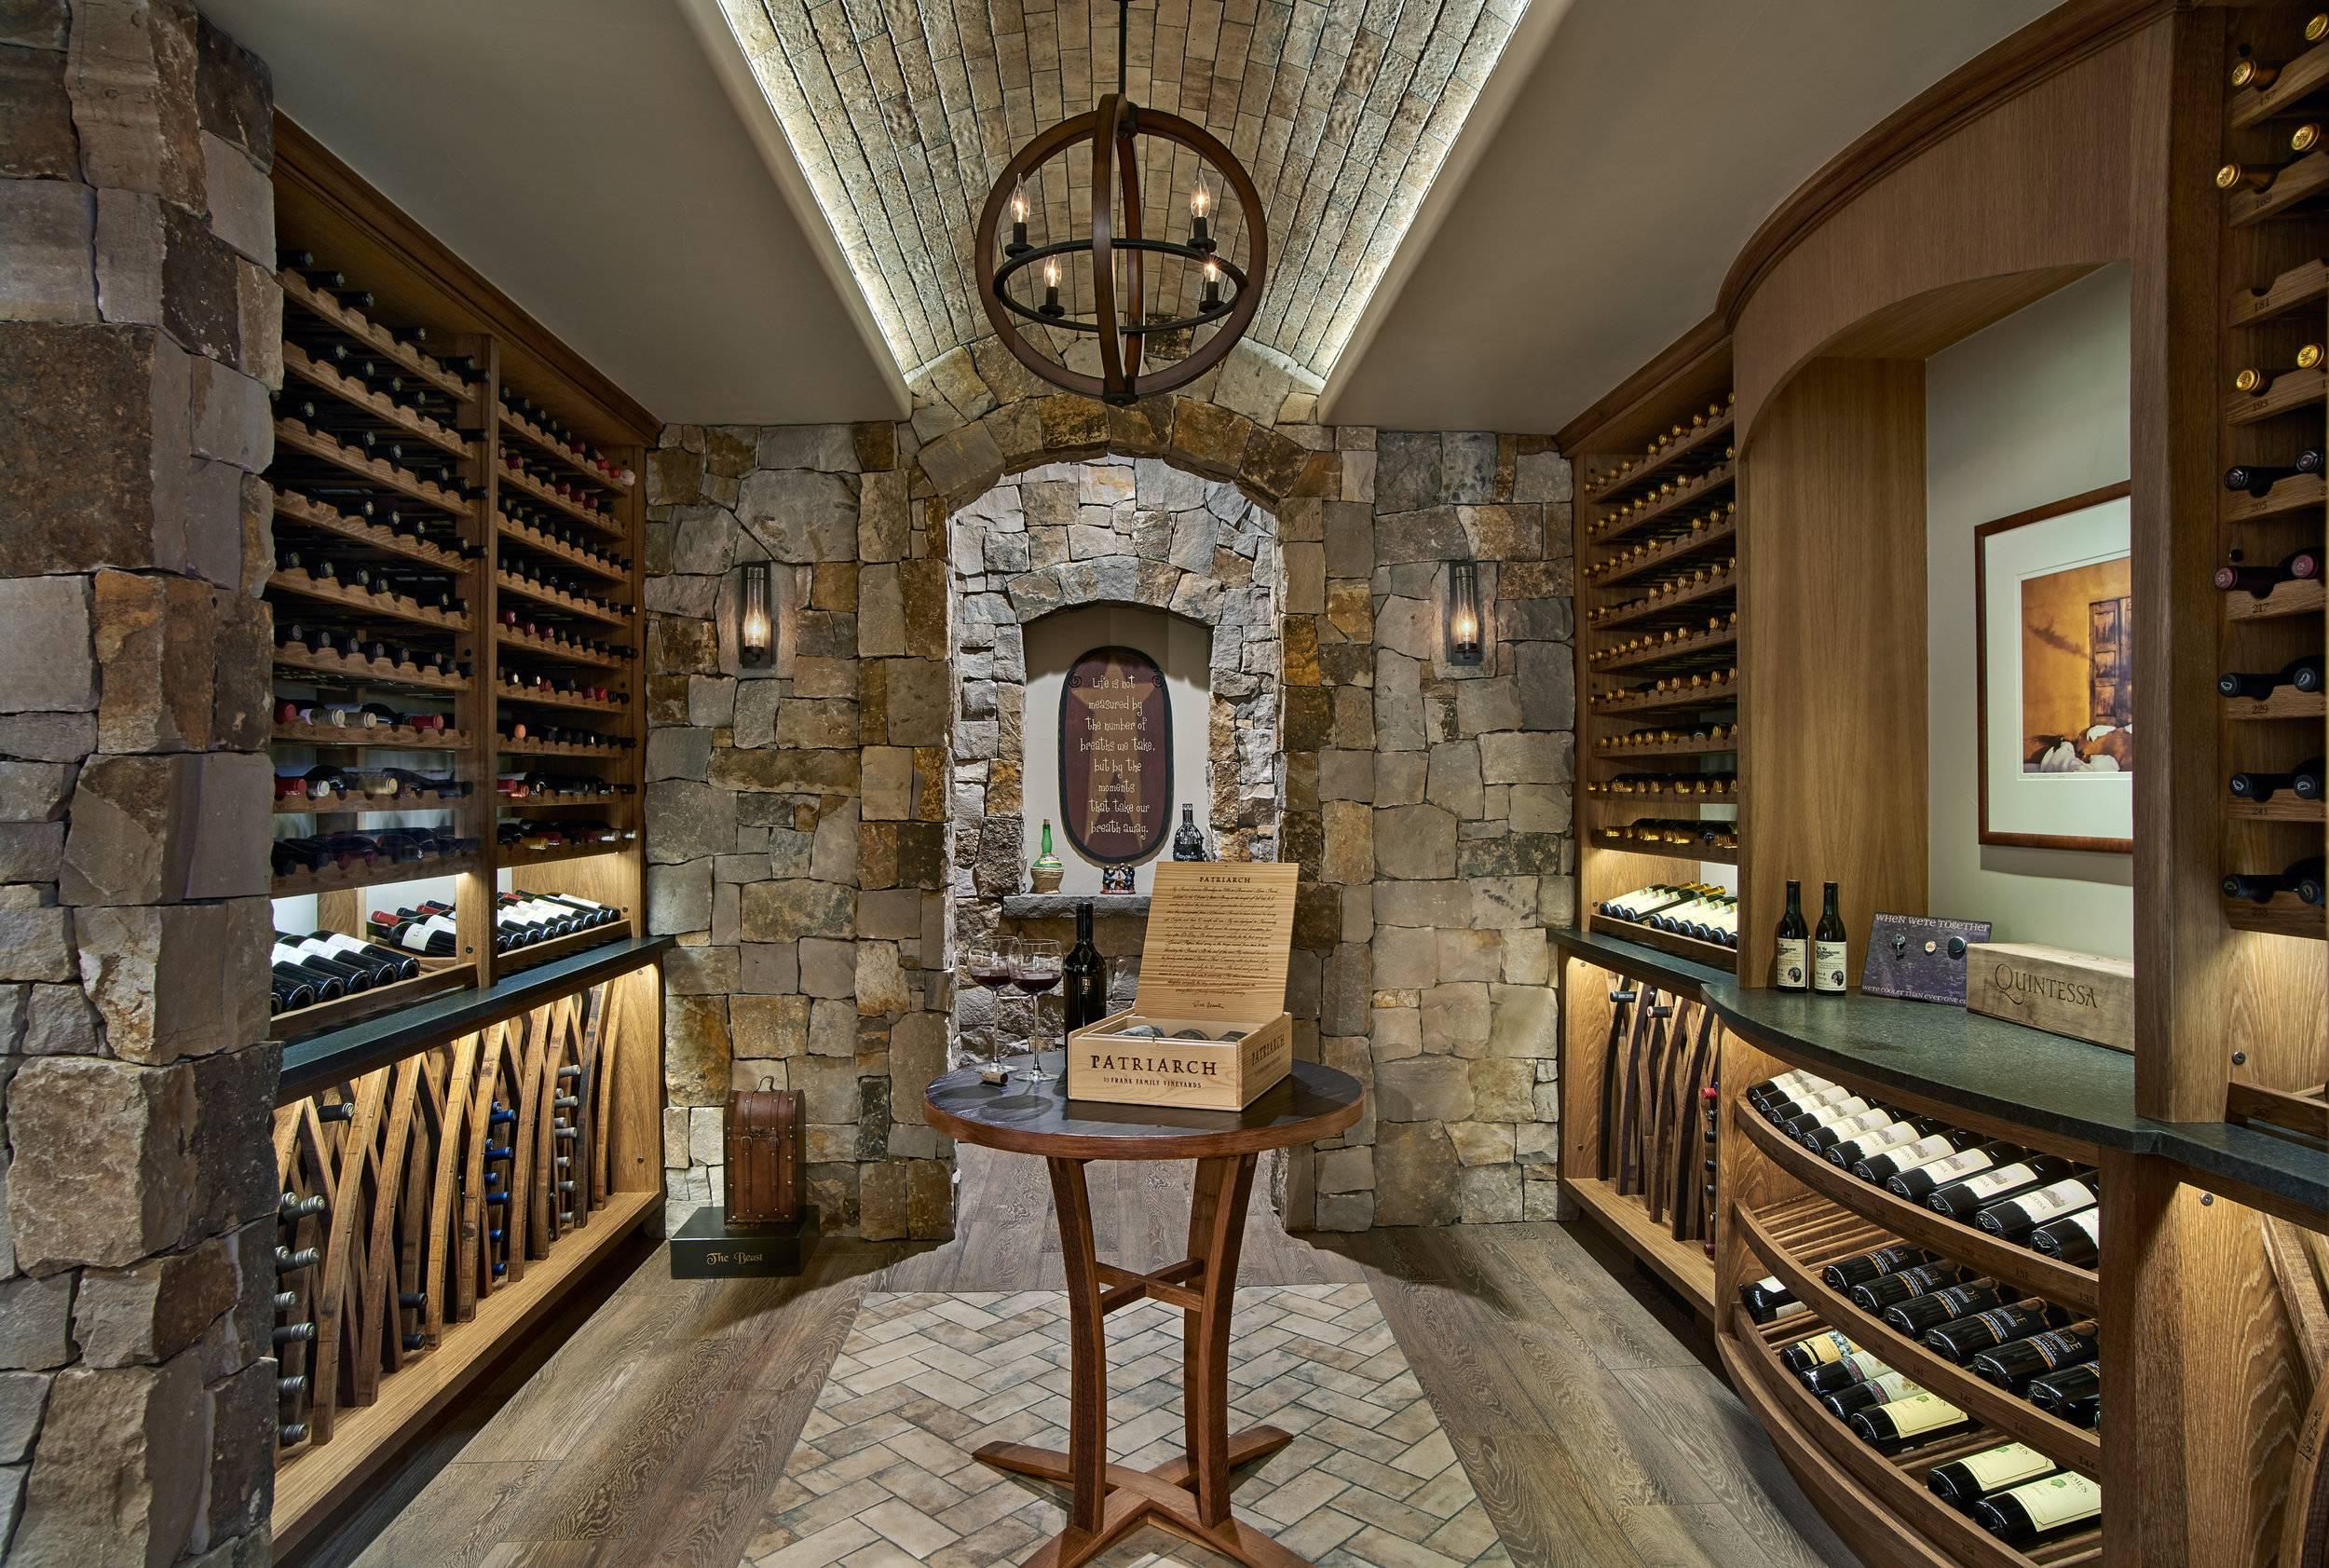 1350 wine cellar a